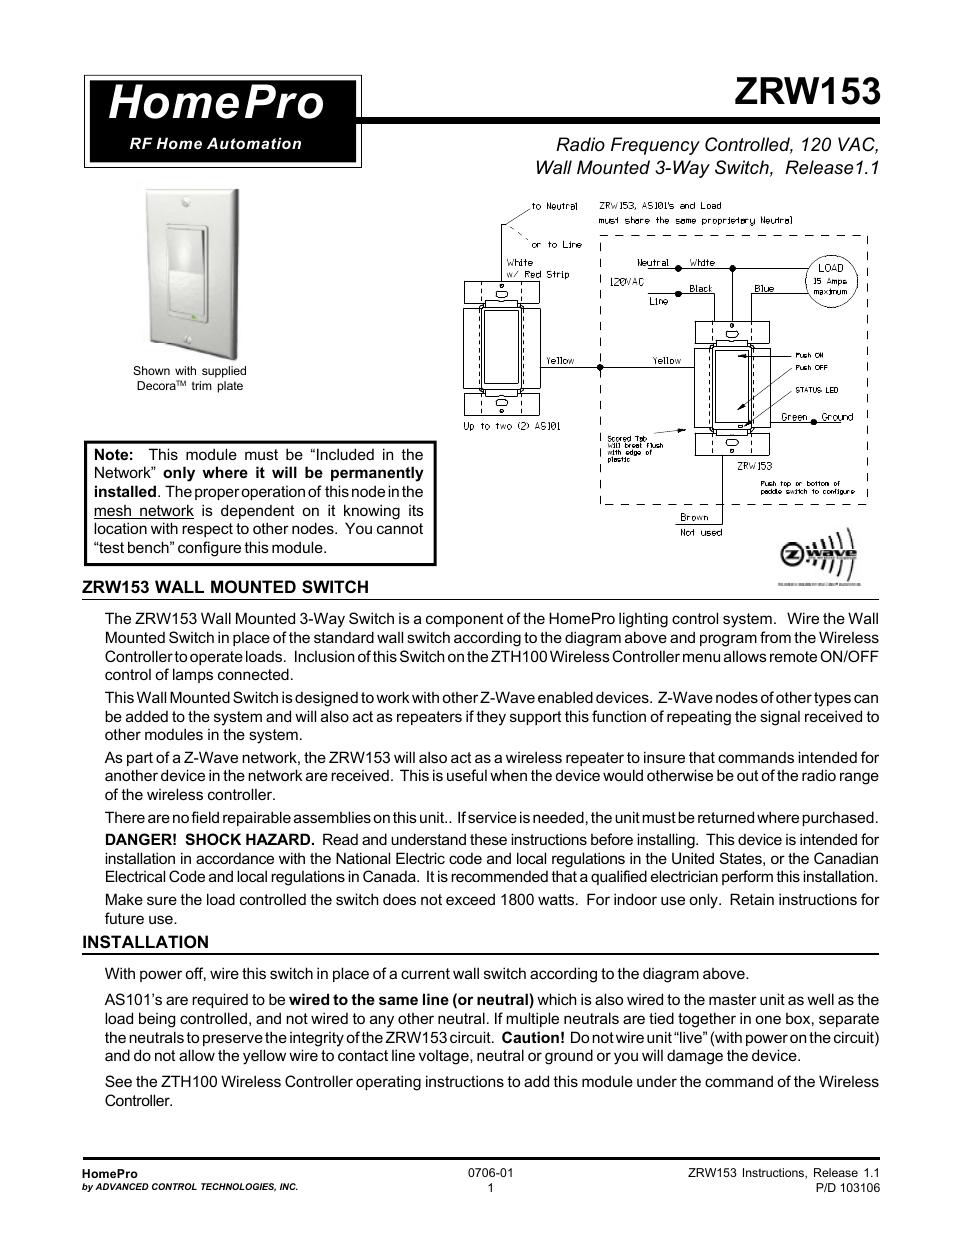 Advanced Control Technologies Specs Instructions ZRW153I (RF 120 VAC ...